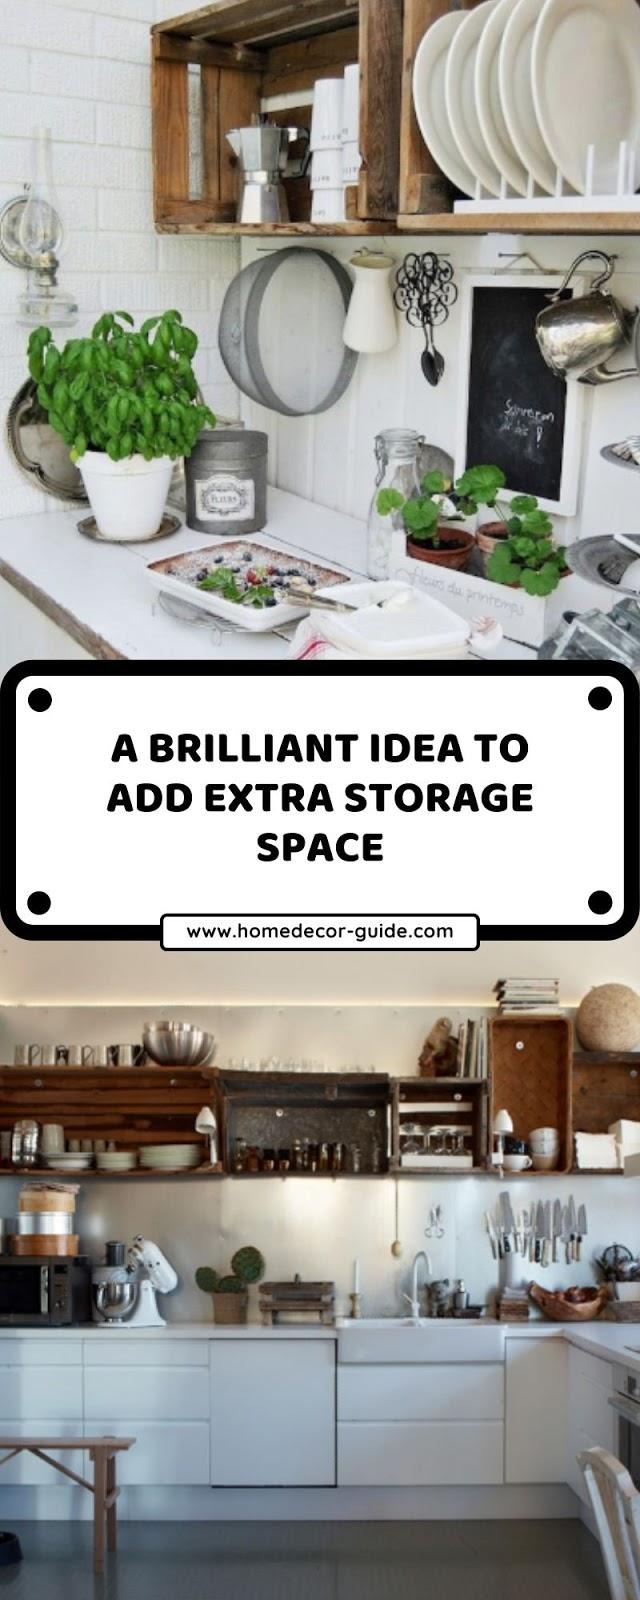 A BRILLIANT IDEA TO ADD EXTRA STORAGE SPACE